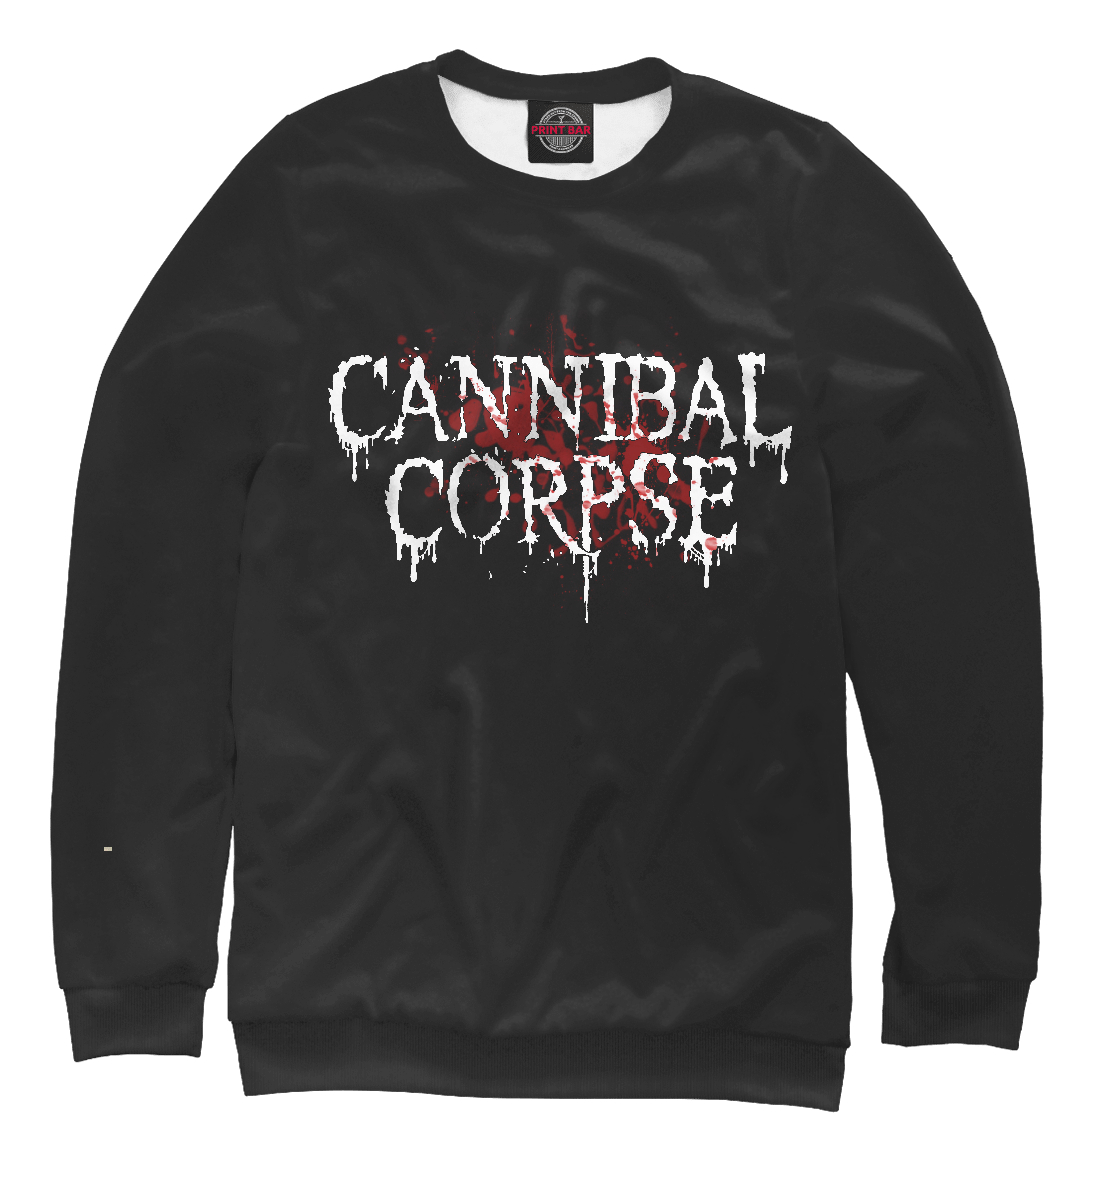 Купить Cannibal Corpse, Printbar, Свитшоты, CCR-677376-swi-1